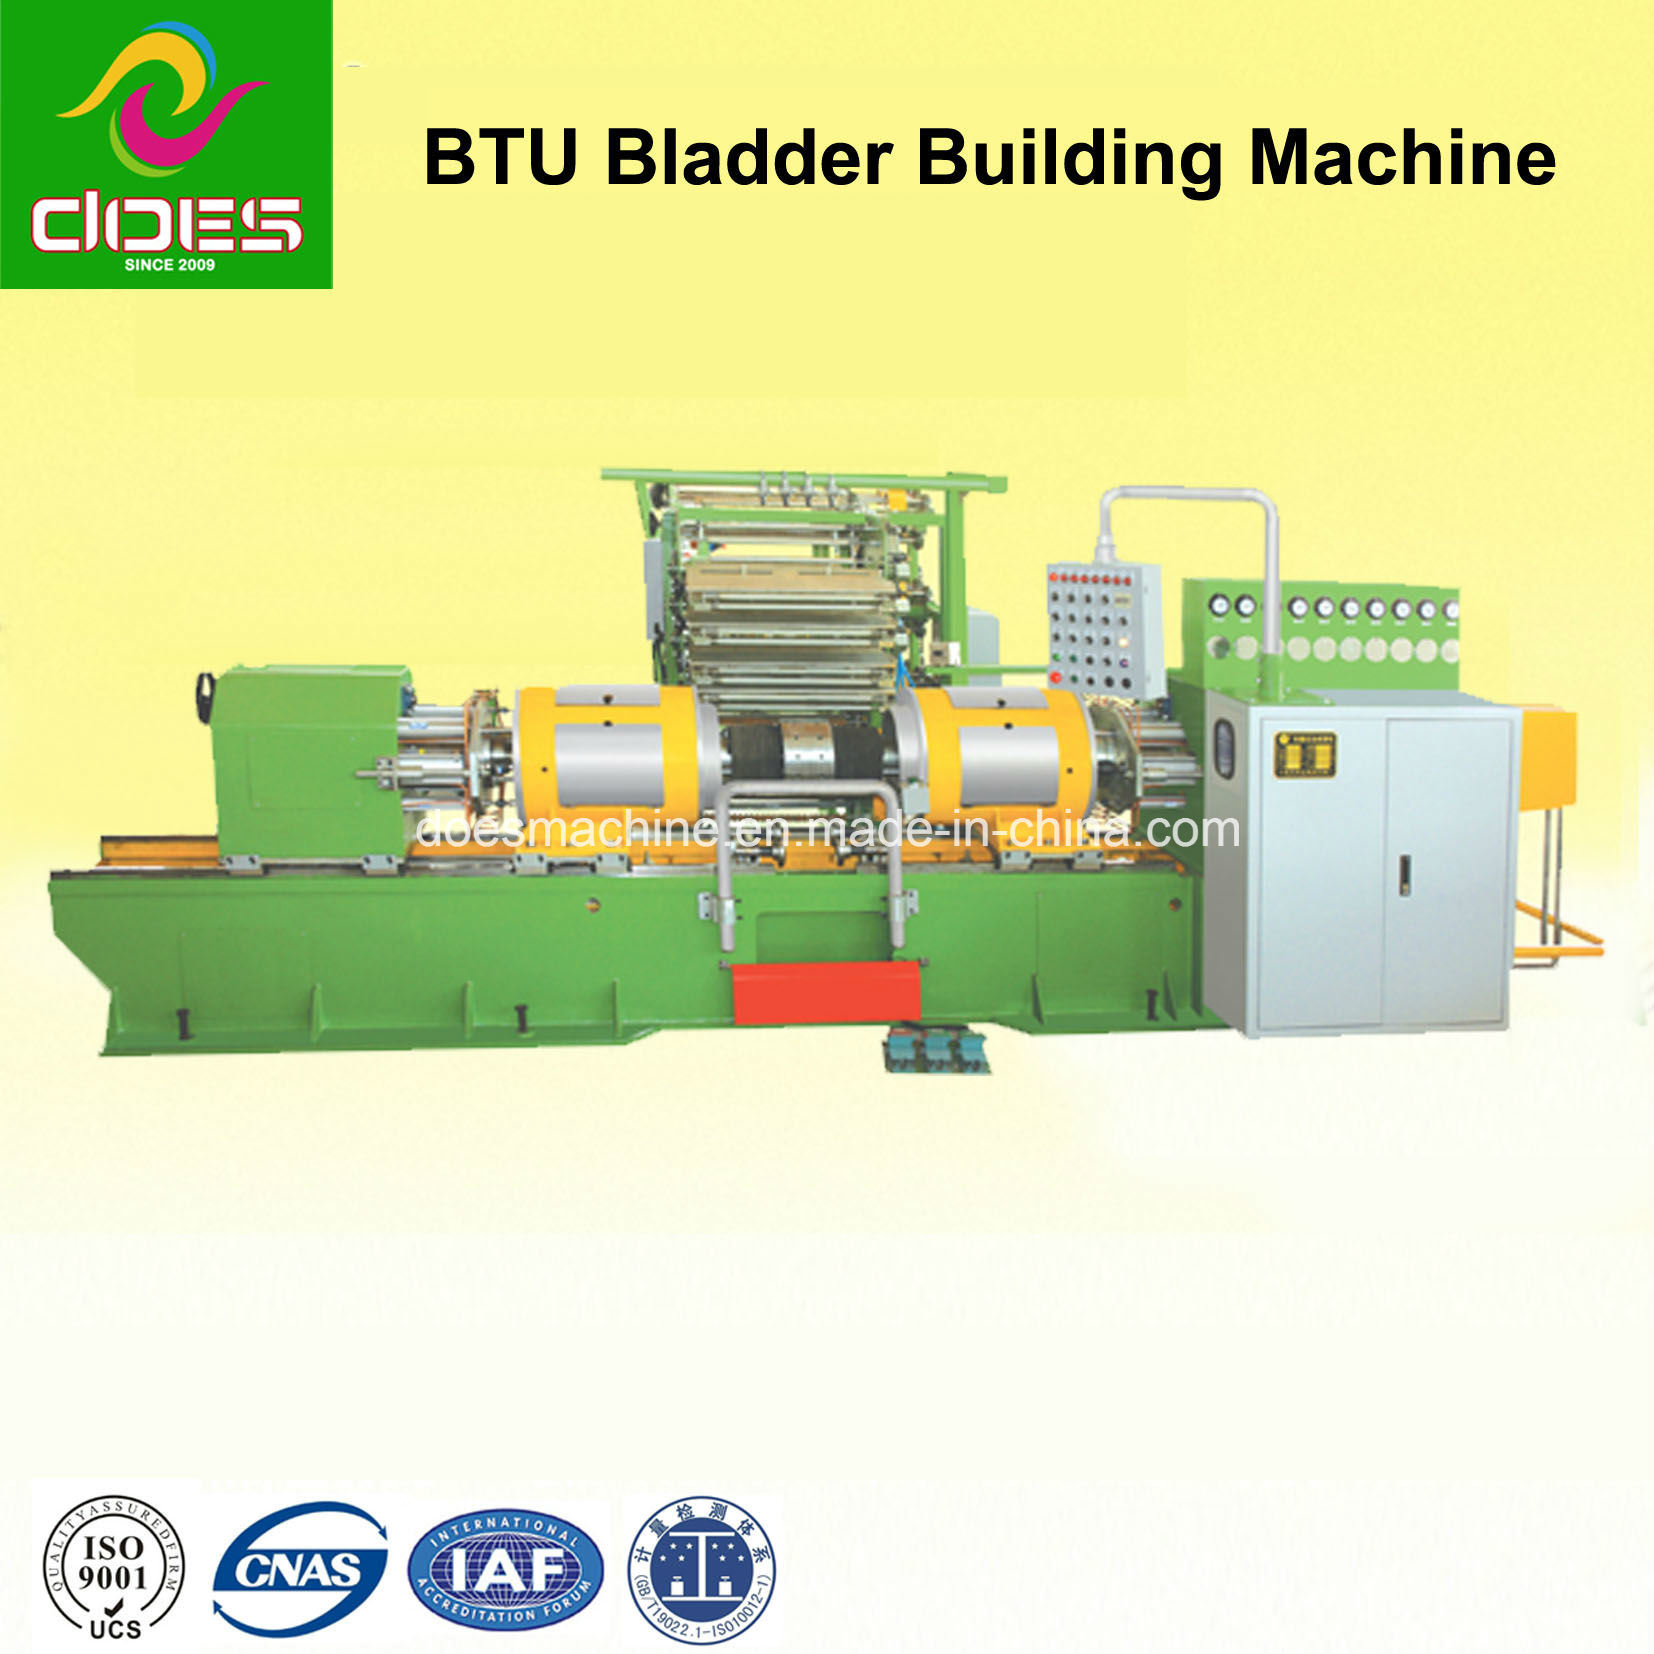 BTU Rubber Tire/Tyre Building Machine for Bladder Turn-up (0814)